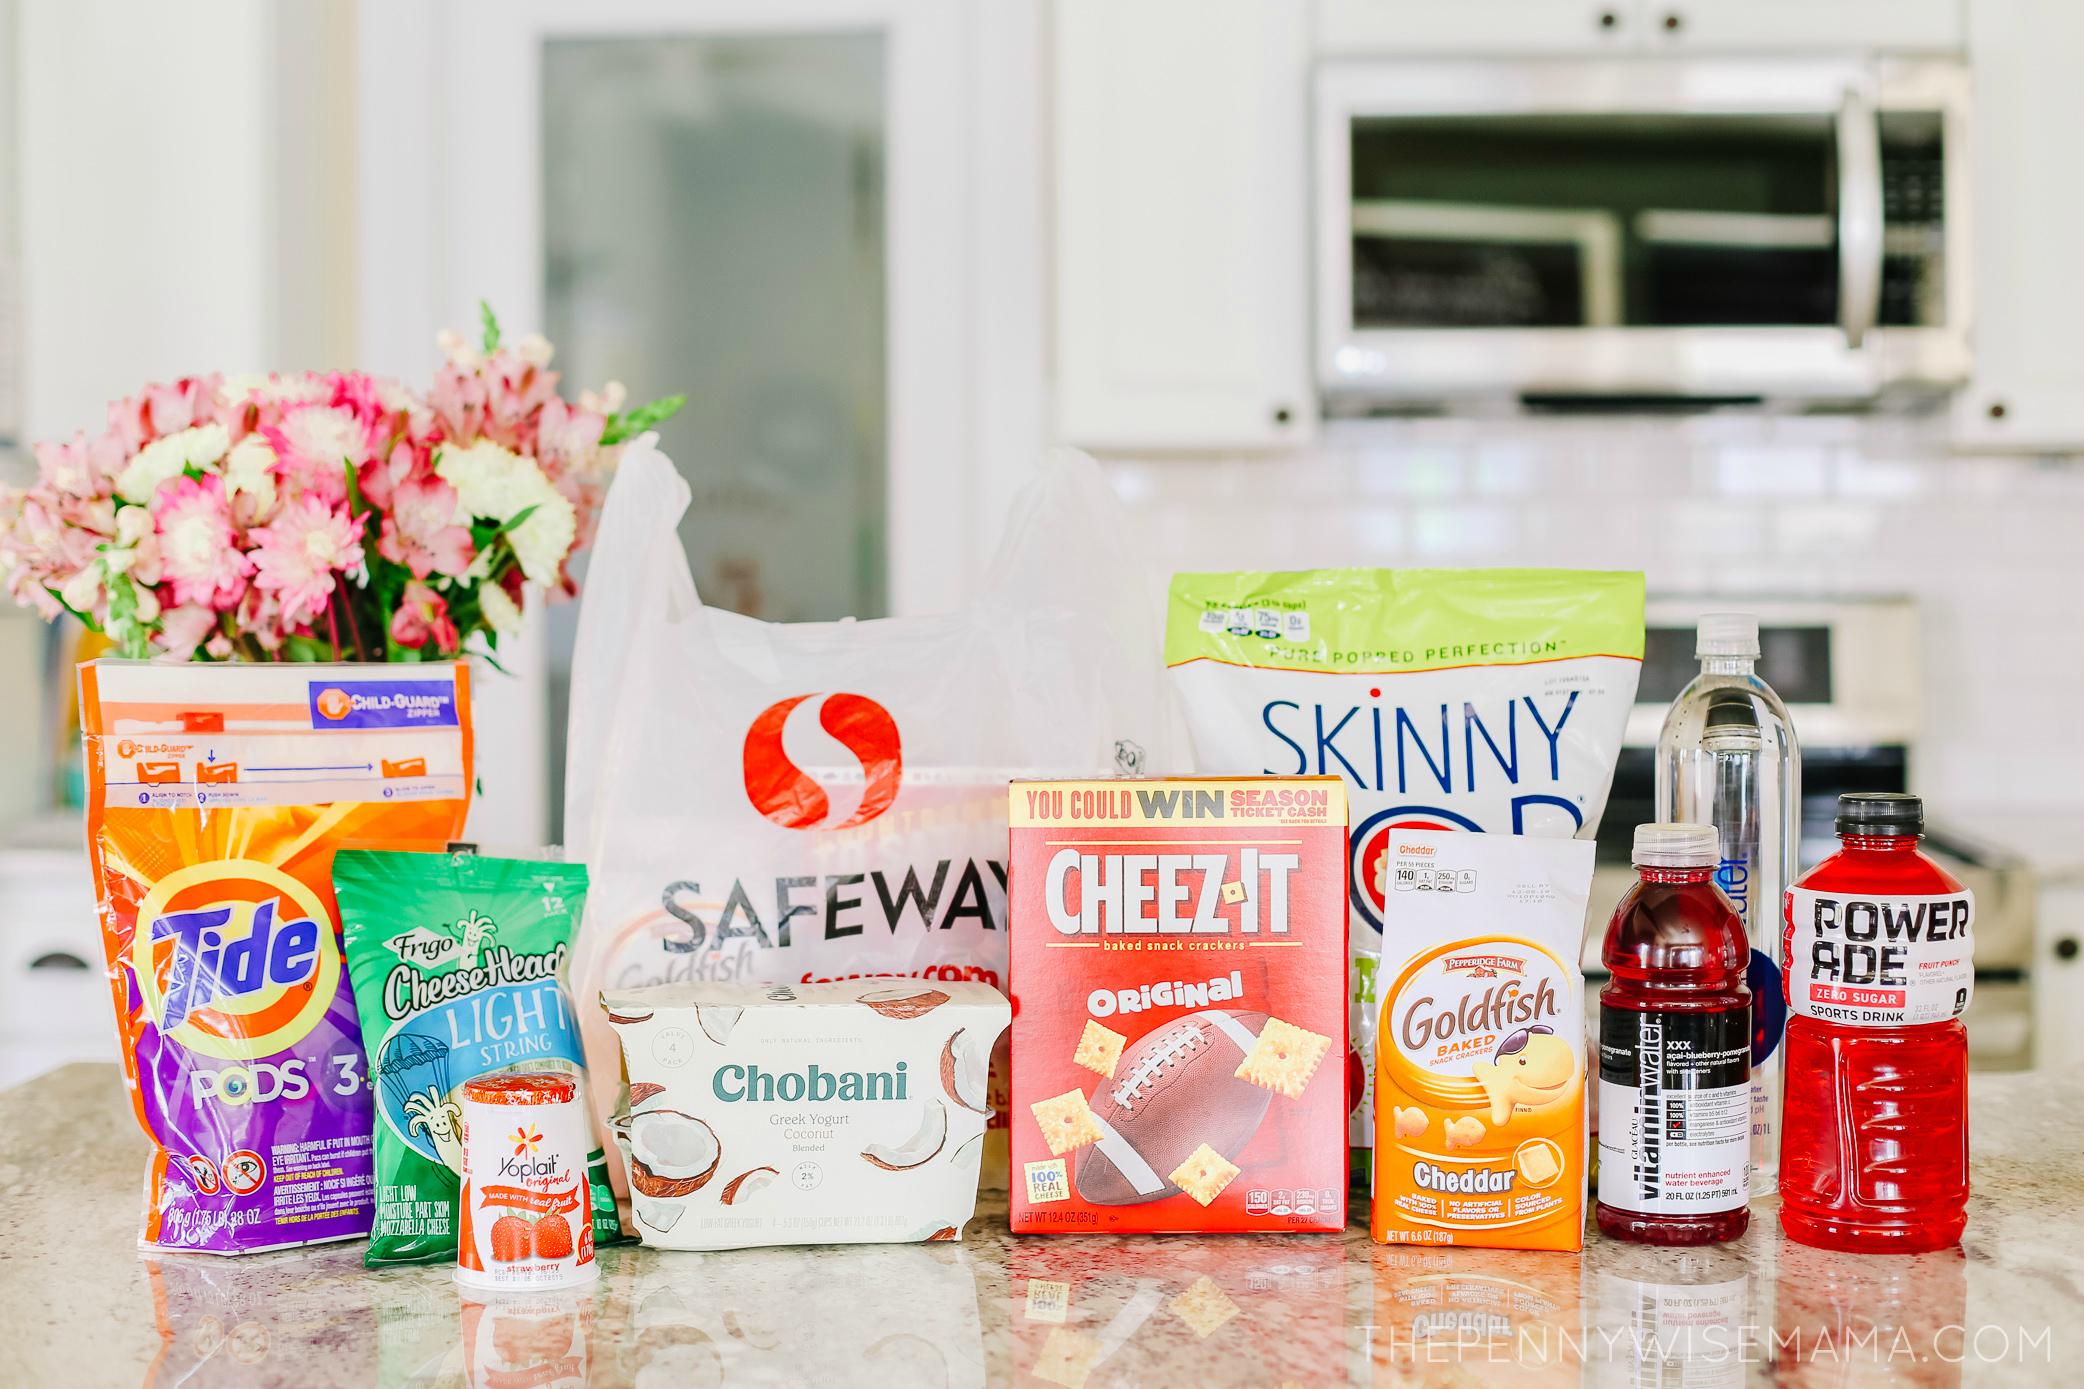 Safeway Stock Up Sale Items